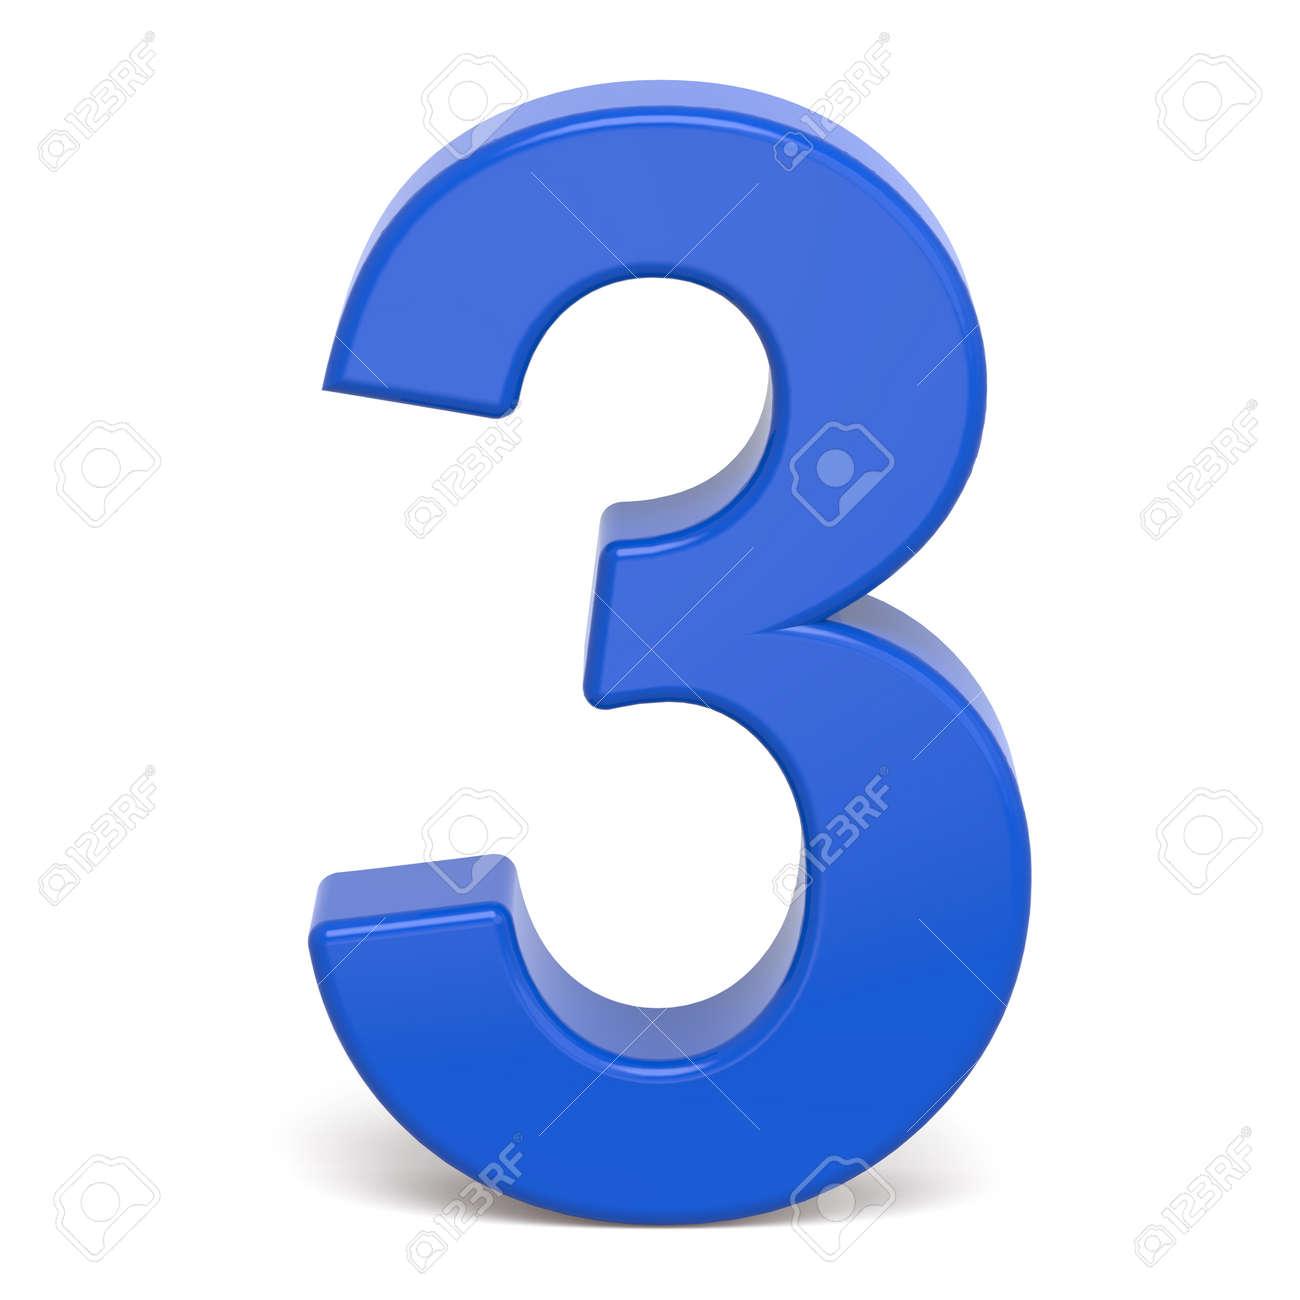 3 D プラスチック青数 3 白い背景に分離 の写真素材・画像素材 Image ...